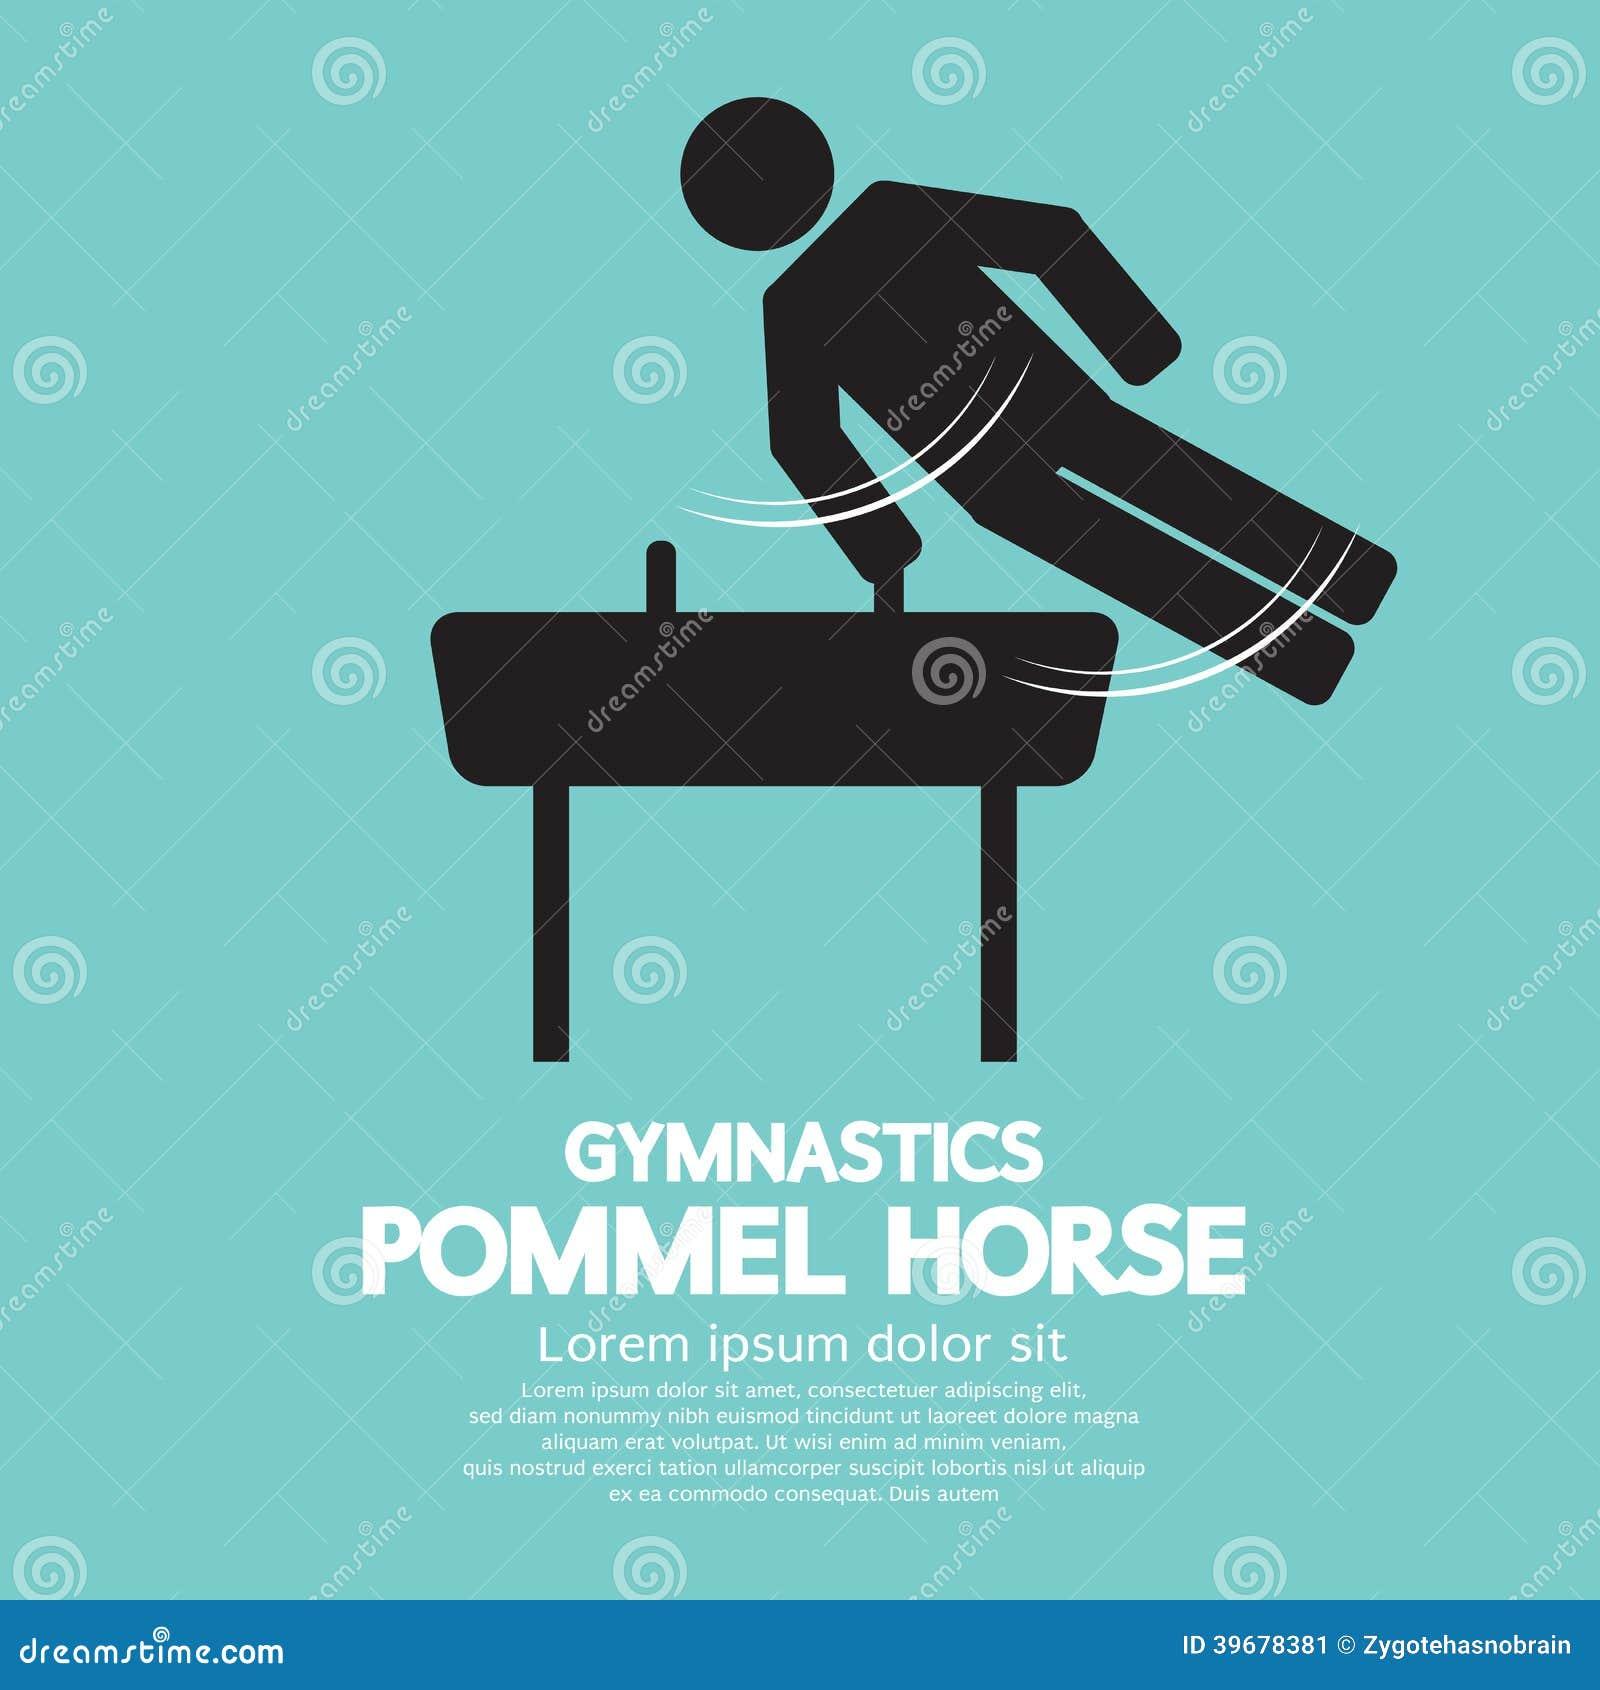 Pommel horse gymnastics stock vector image of background